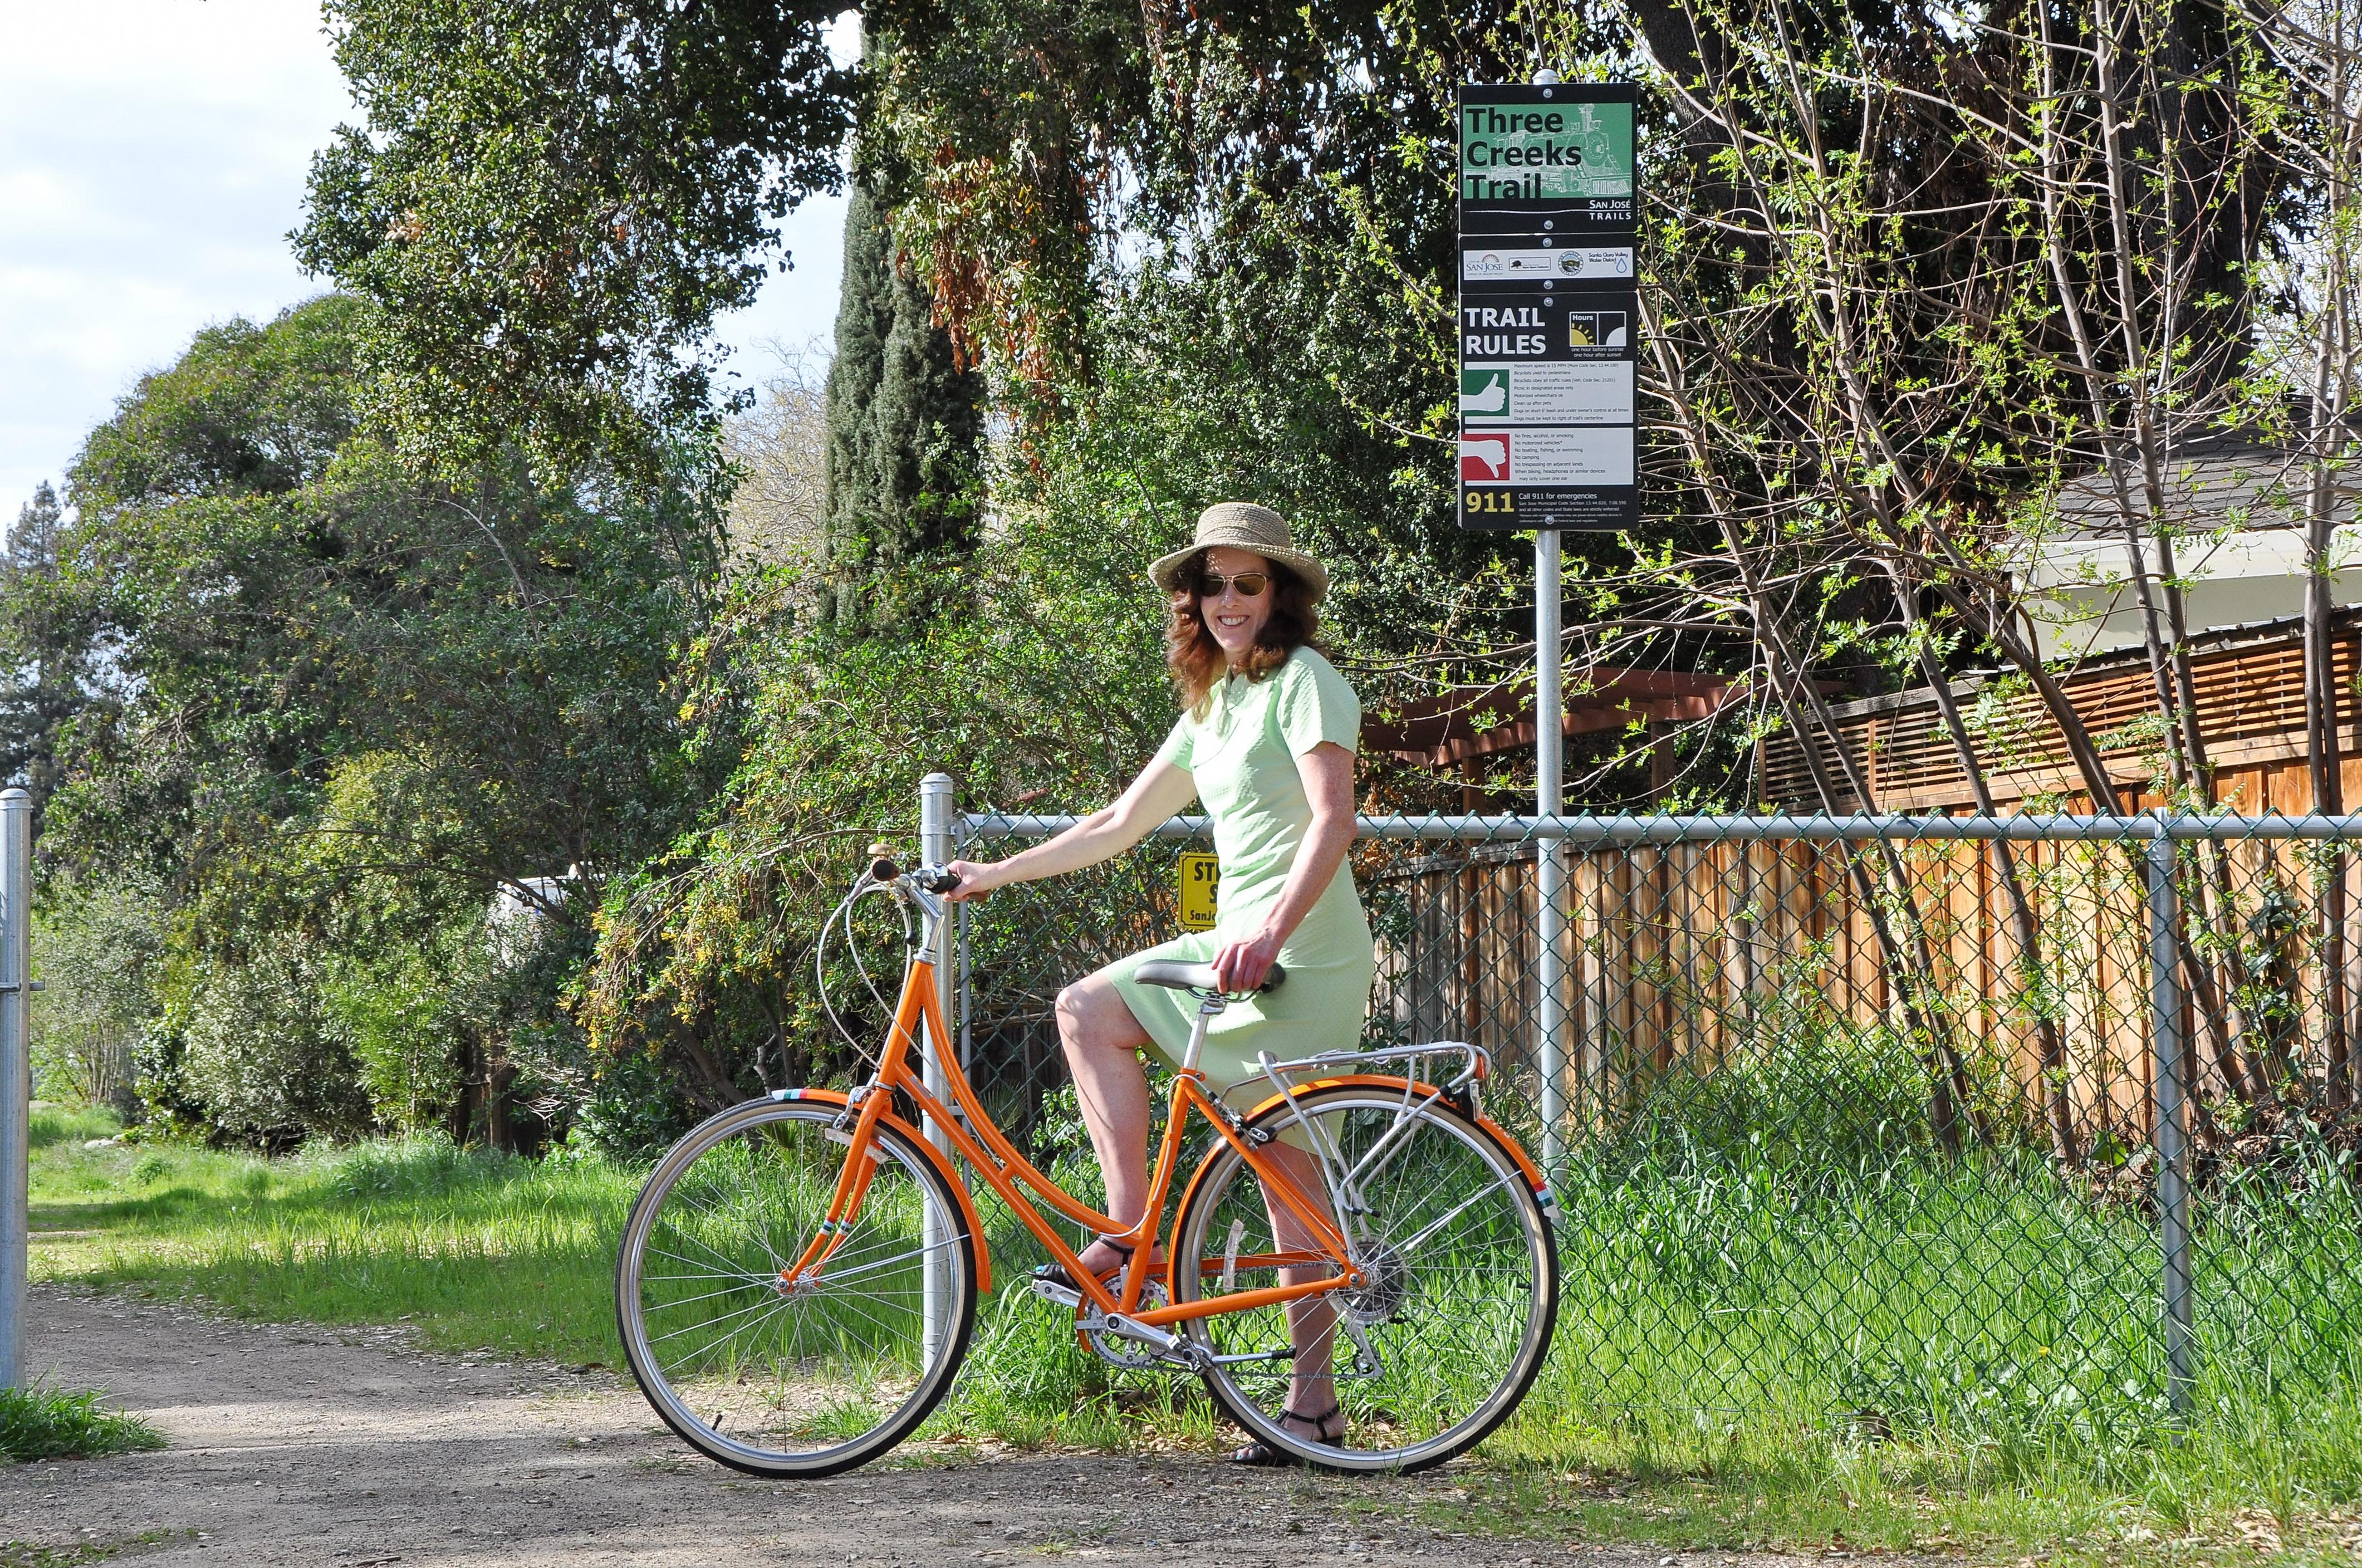 Three Creeks Trail - Cyclist - L.Ames - 02-28-2014 - 7